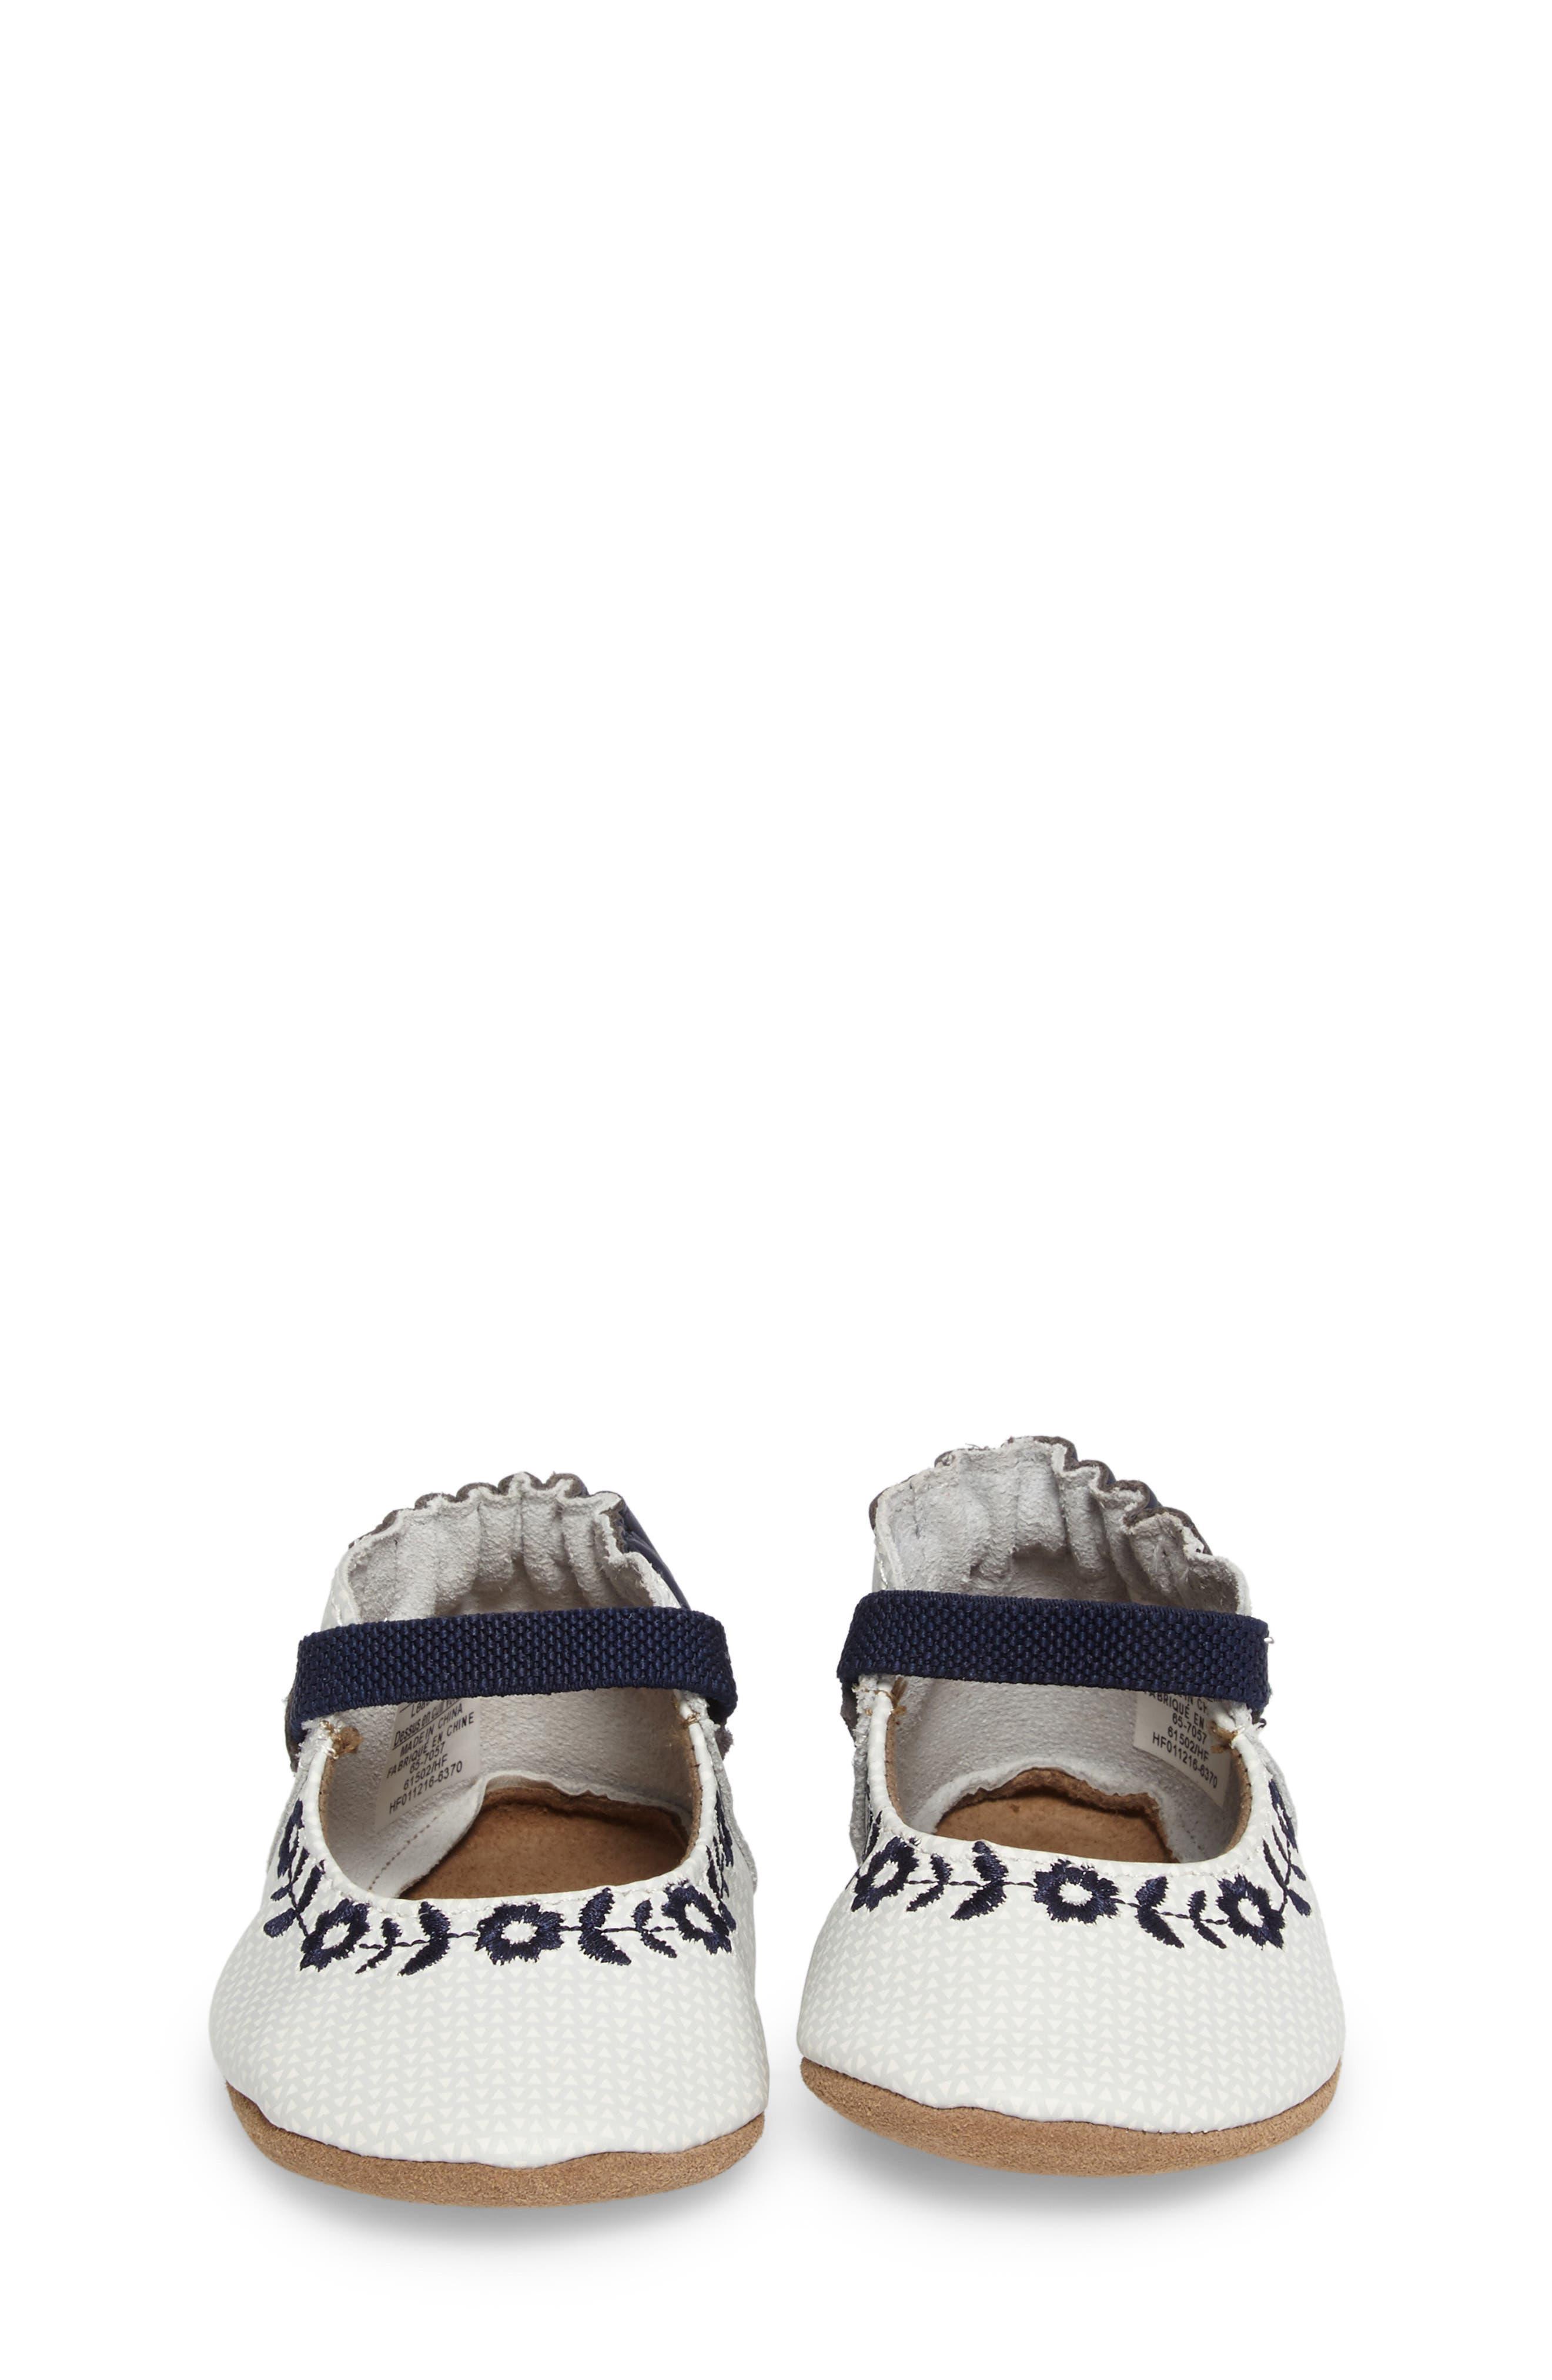 Alternate Image 3  - Robeez® Daisy Lane Embroidered Mary Jane Crib Shoe (Baby & Walker)